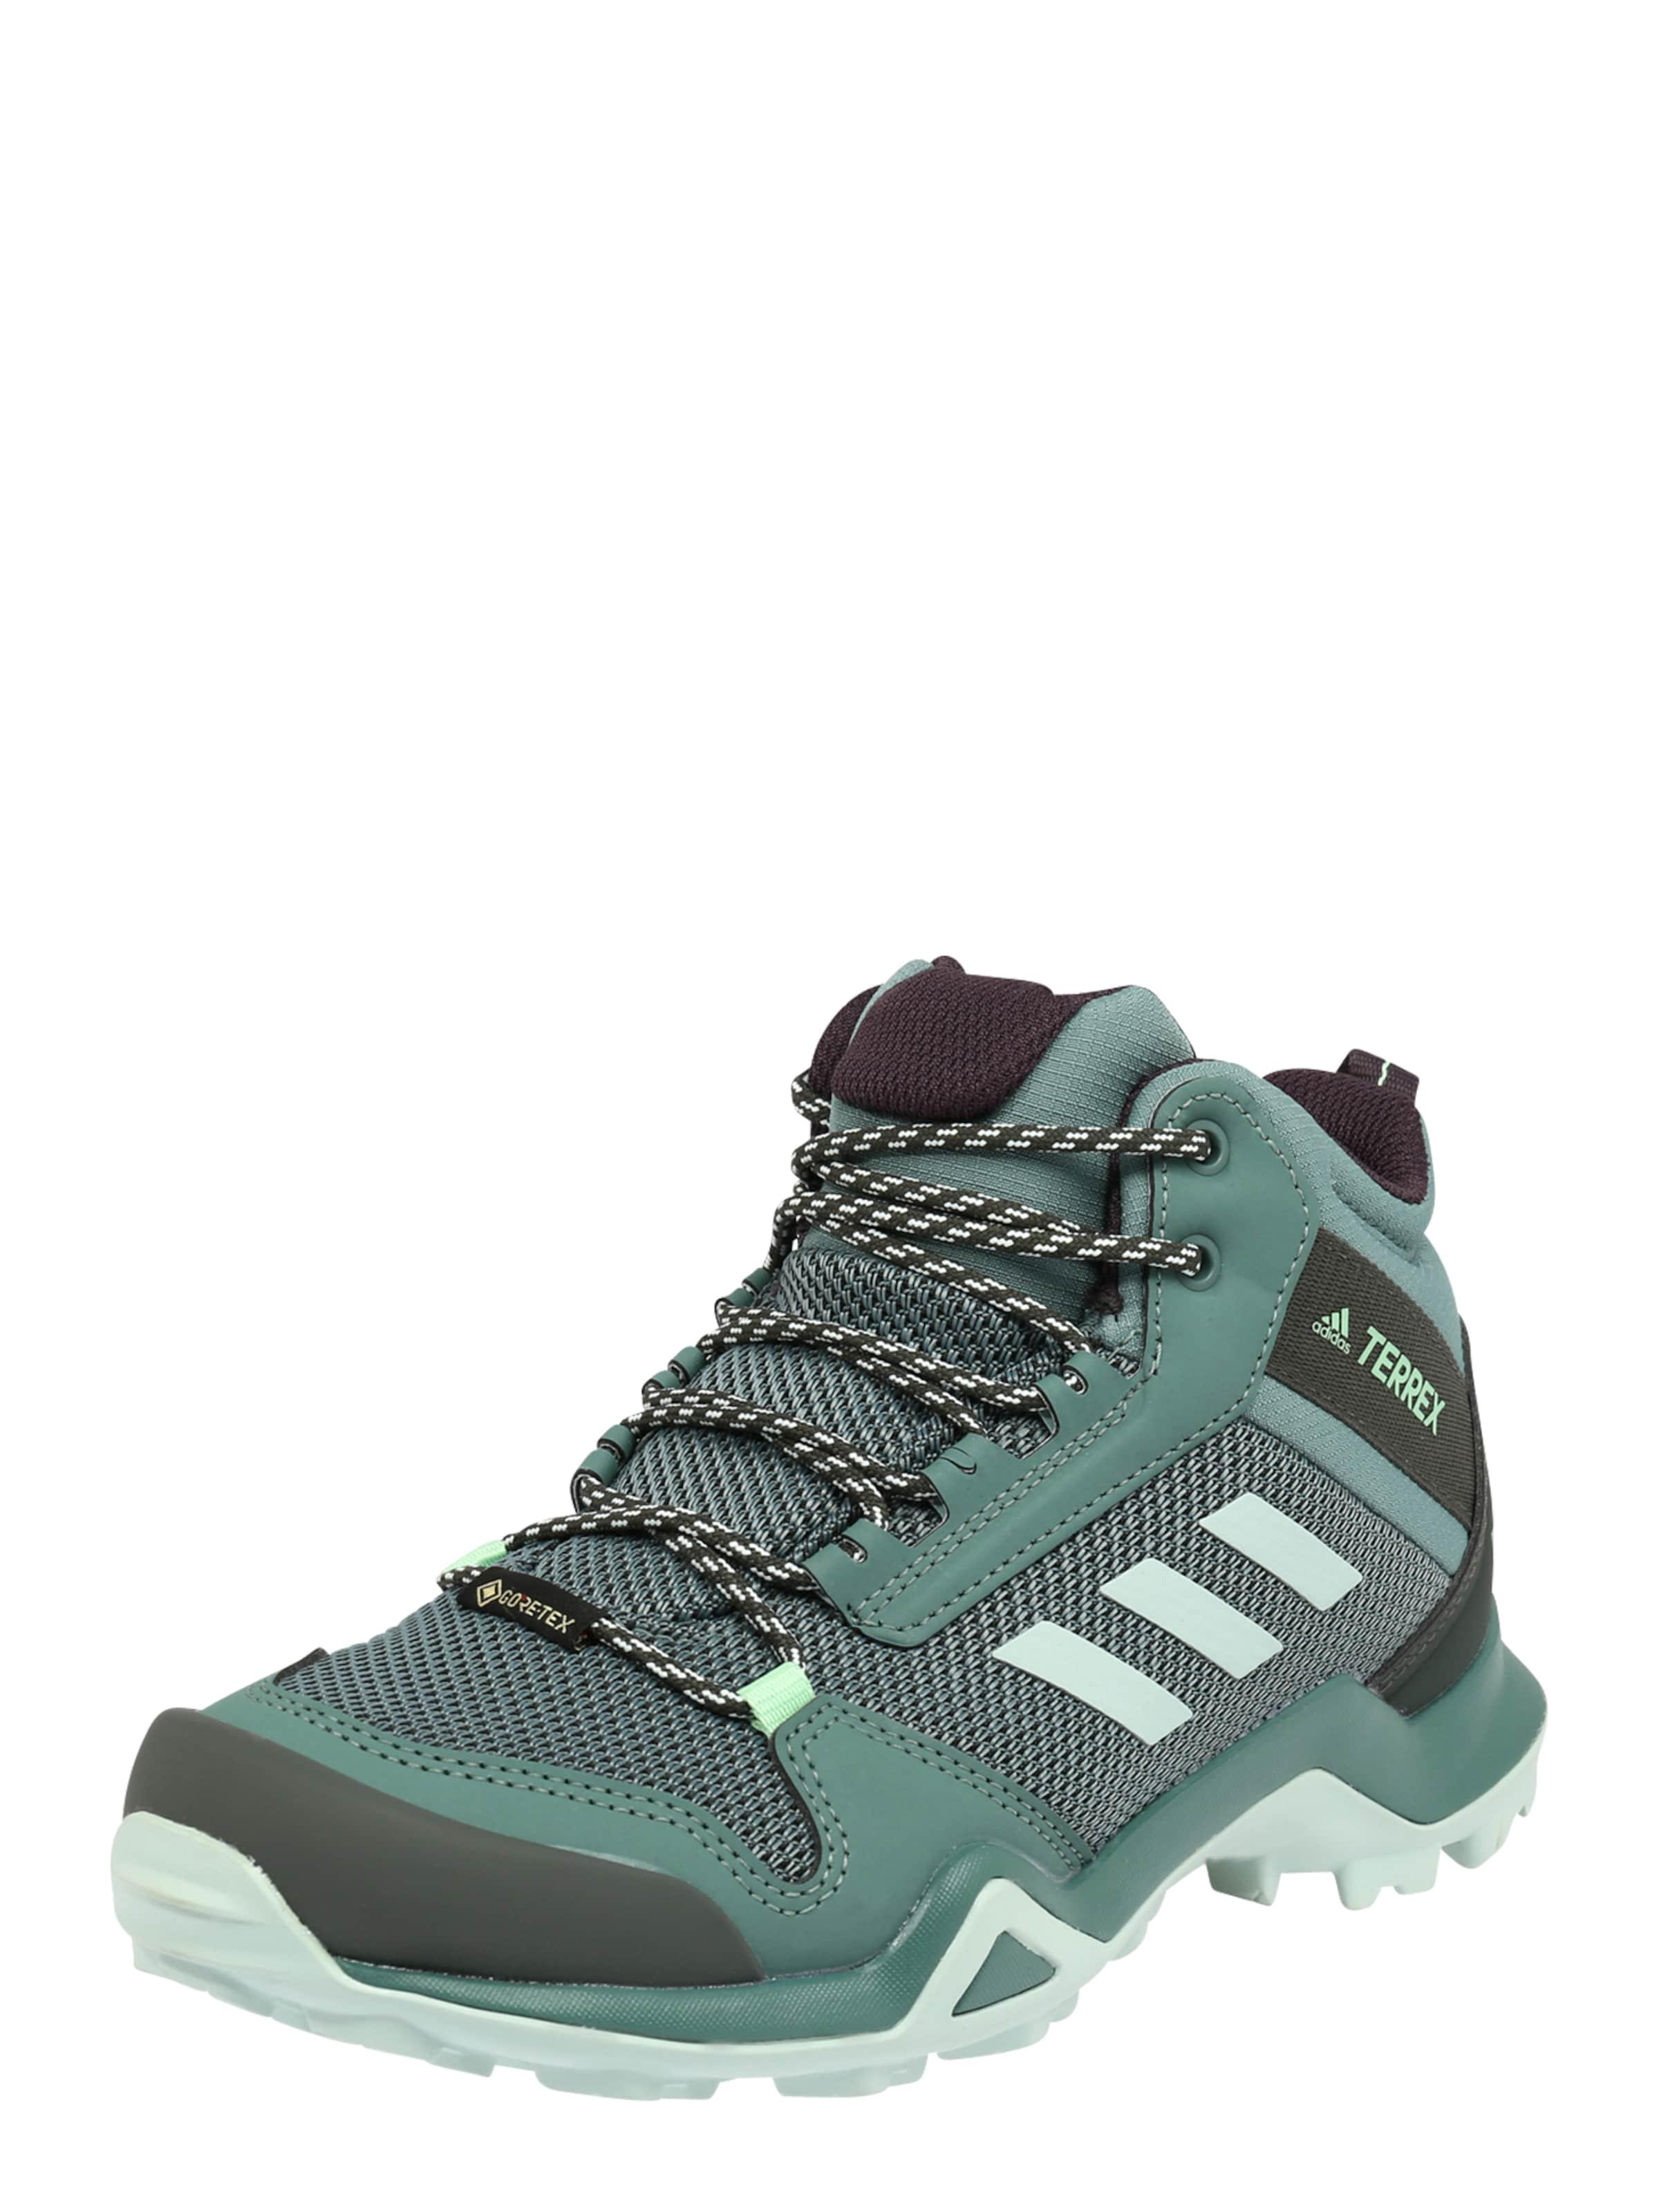 ADIDAS PERFORMANCE Boots in grün